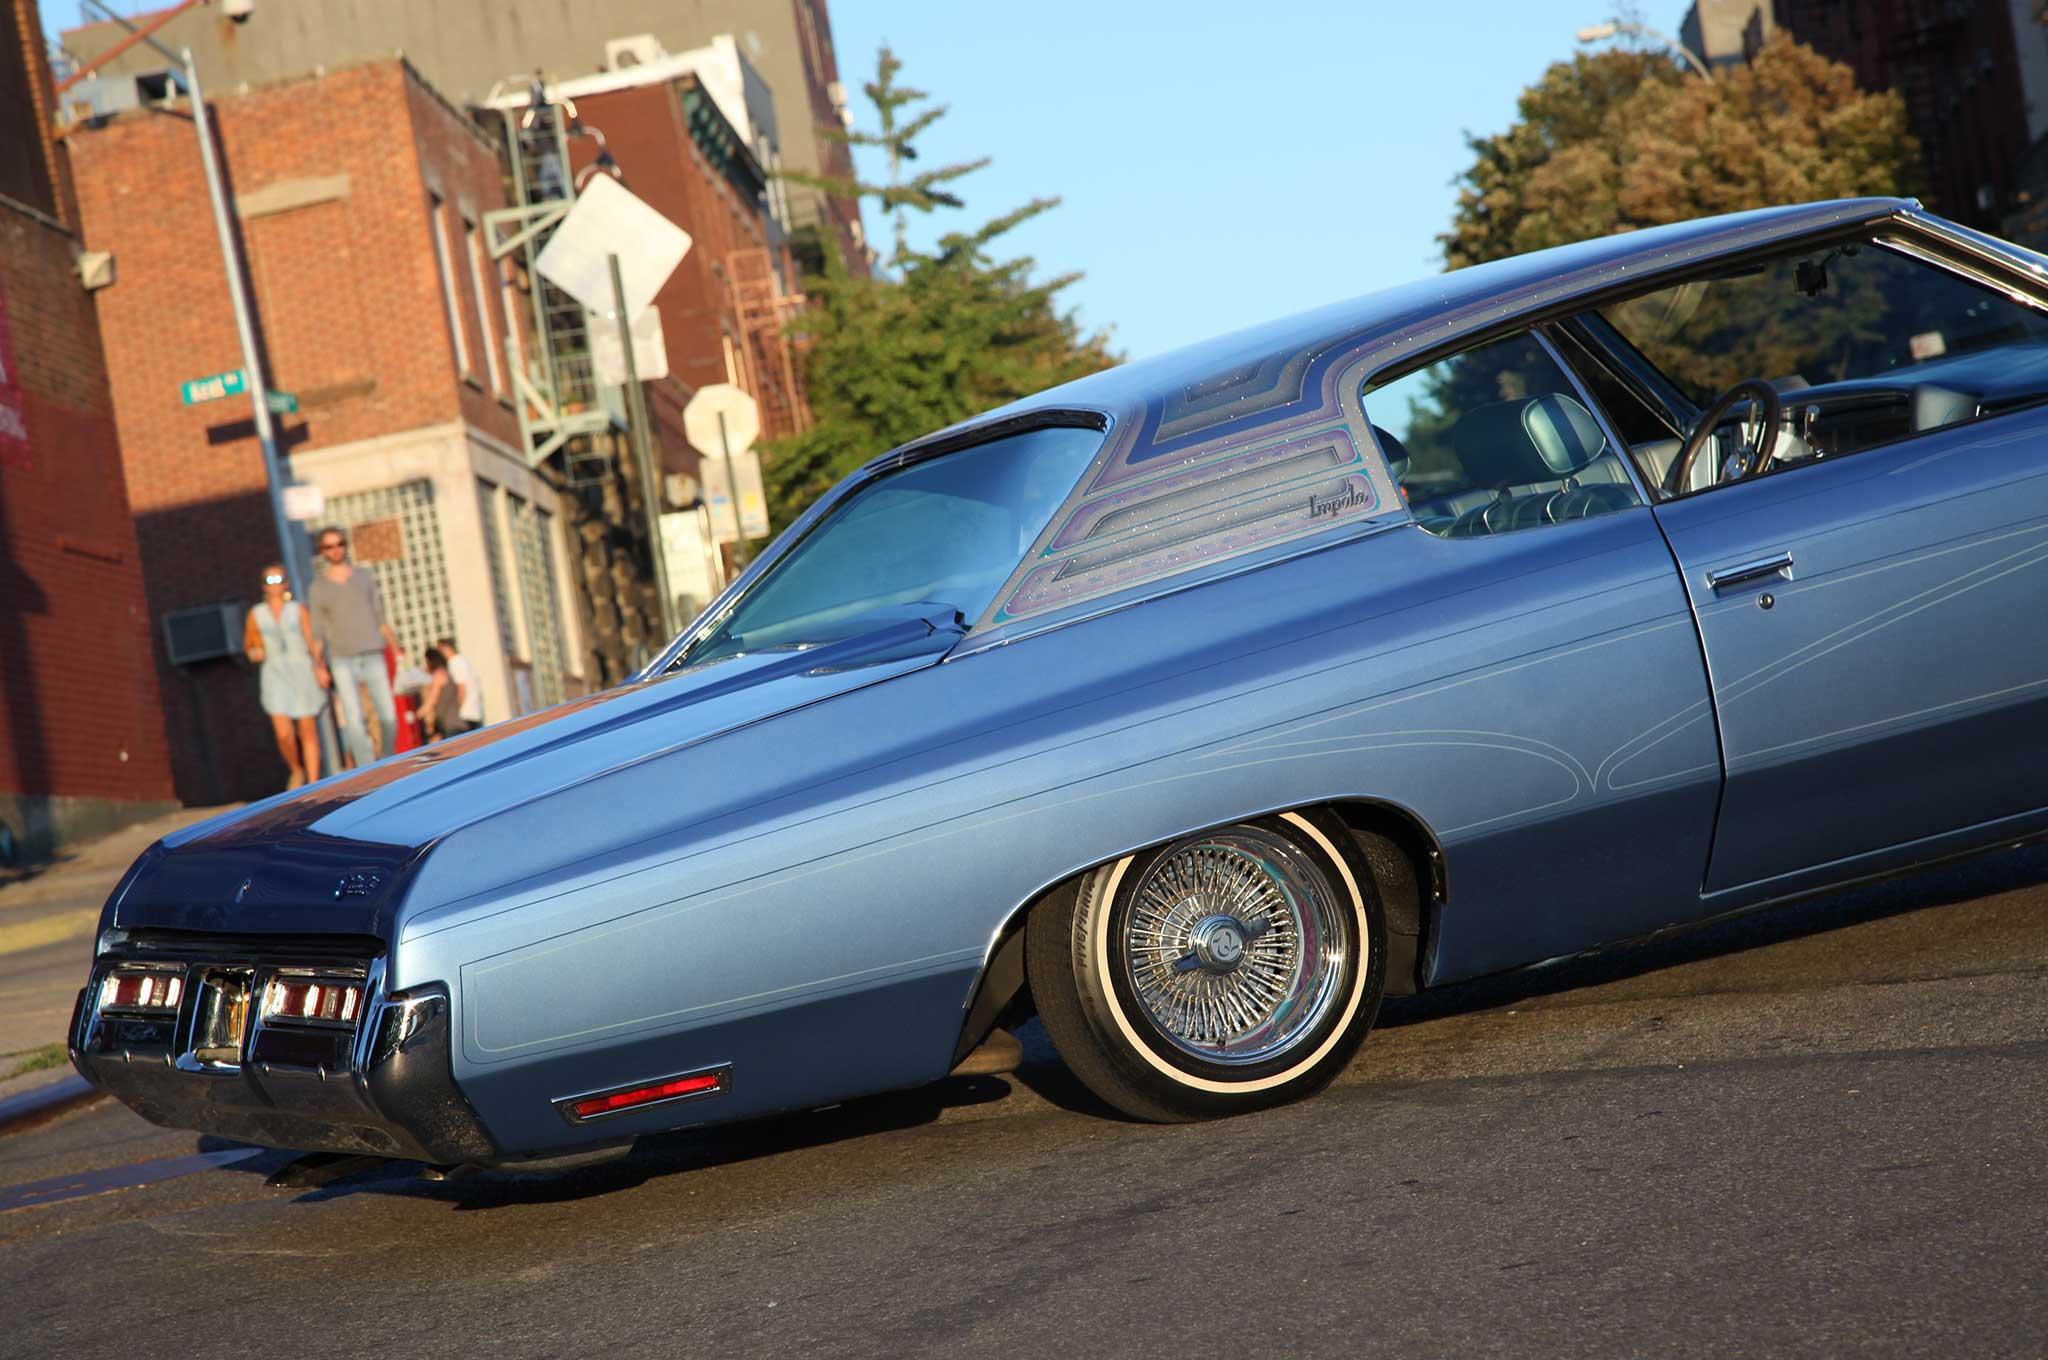 Chevrolet Impala Rear Quarter Panel